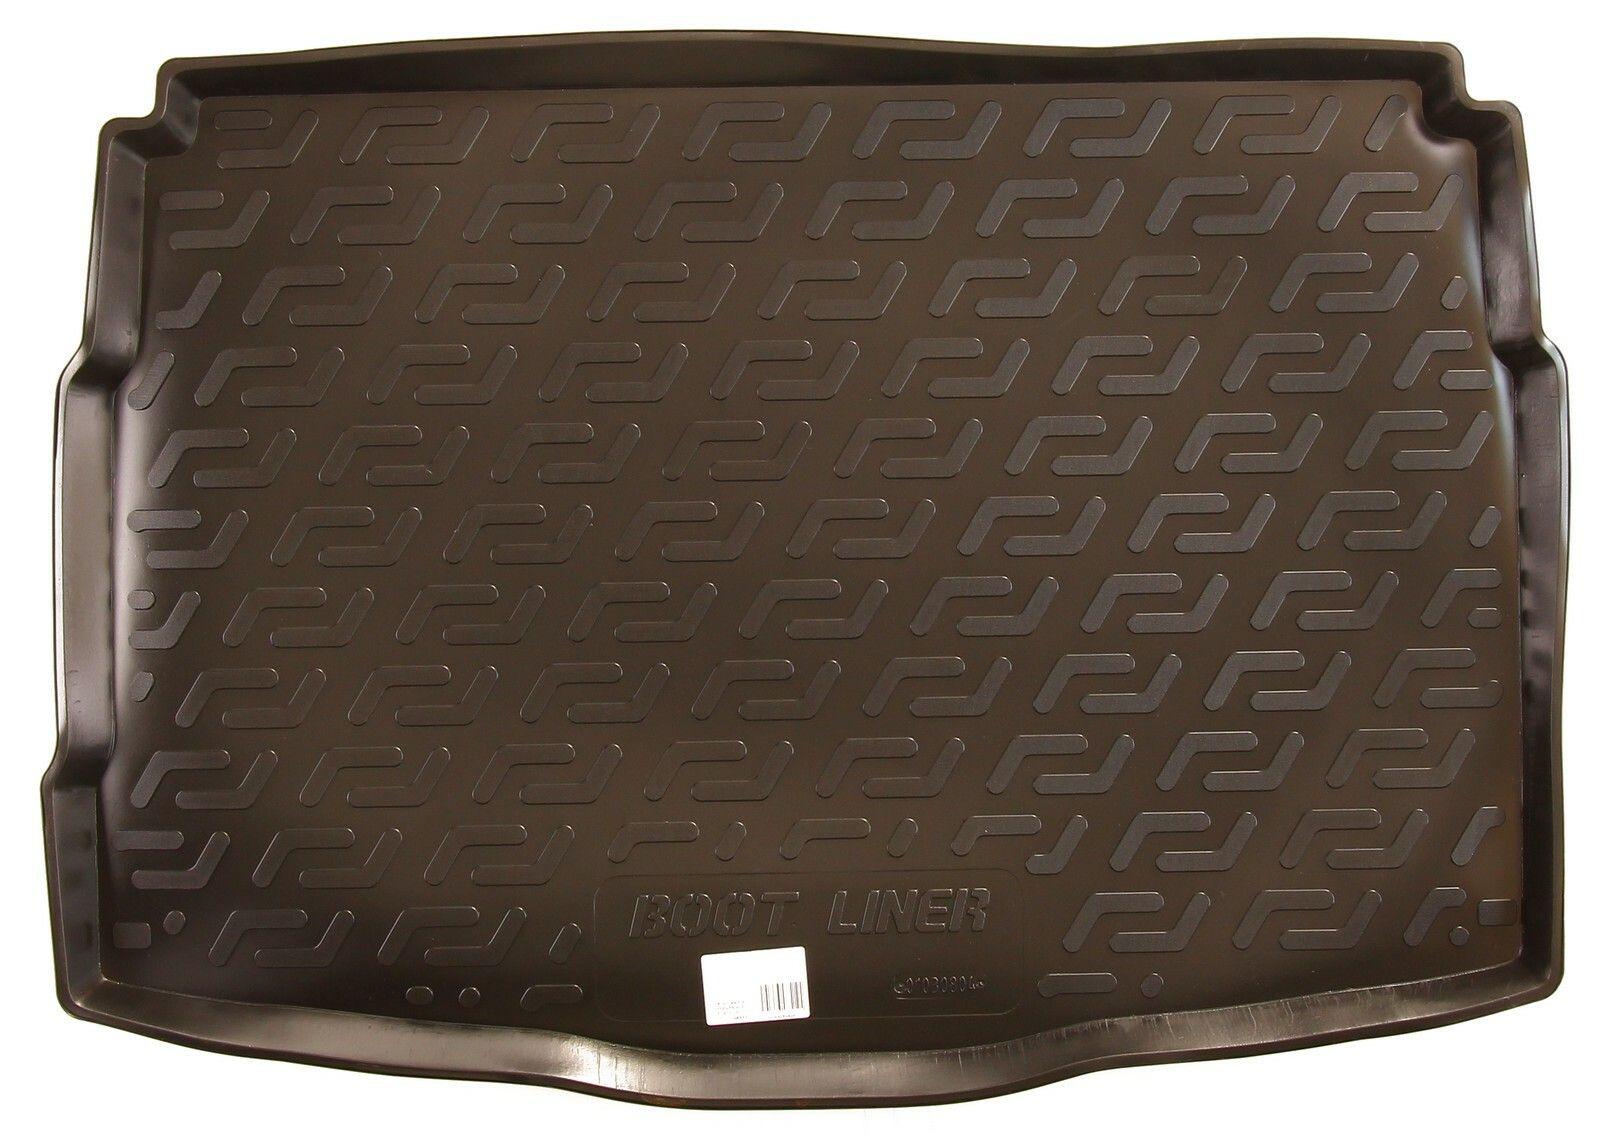 Vana do kufru plastová Kia Ceed II Hatchback Premium (EU) (12-) SIXTOL